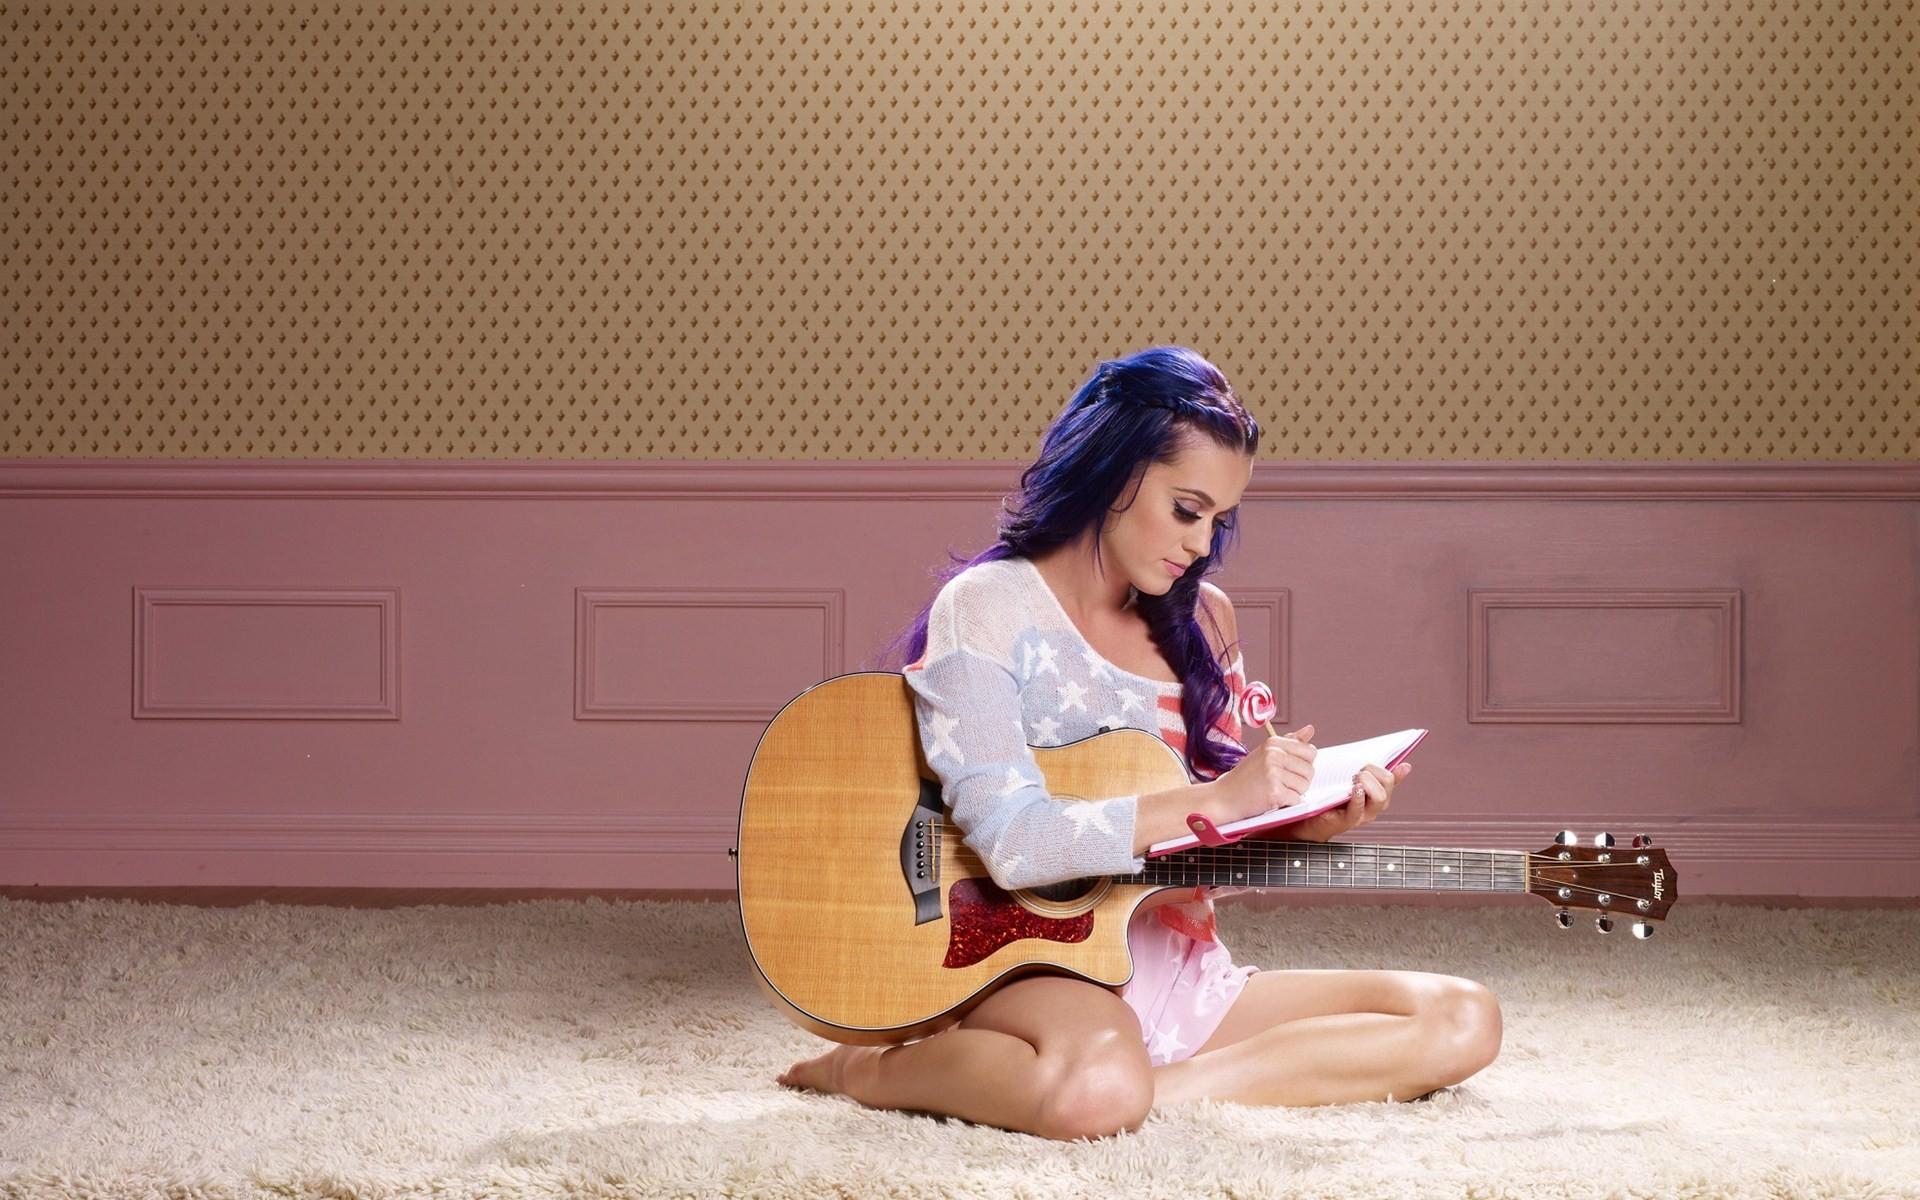 Katy Perry Wallpaper guitar cute